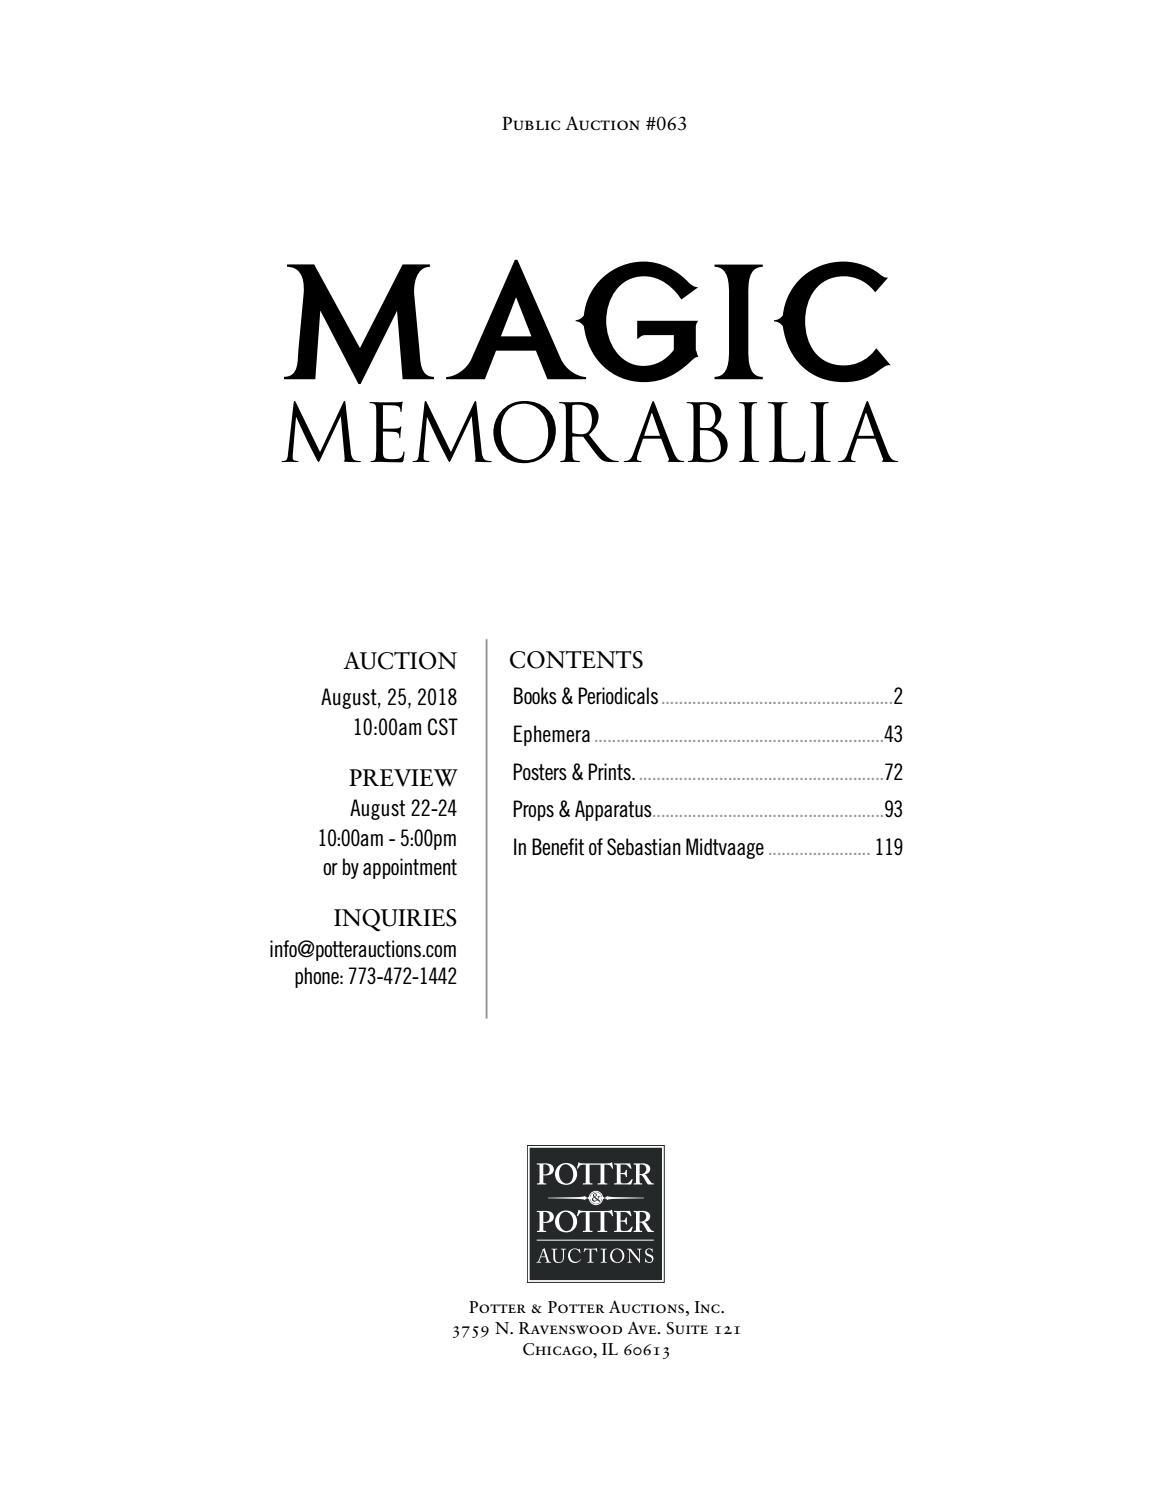 Magic Memorabilia   Vebuka.com